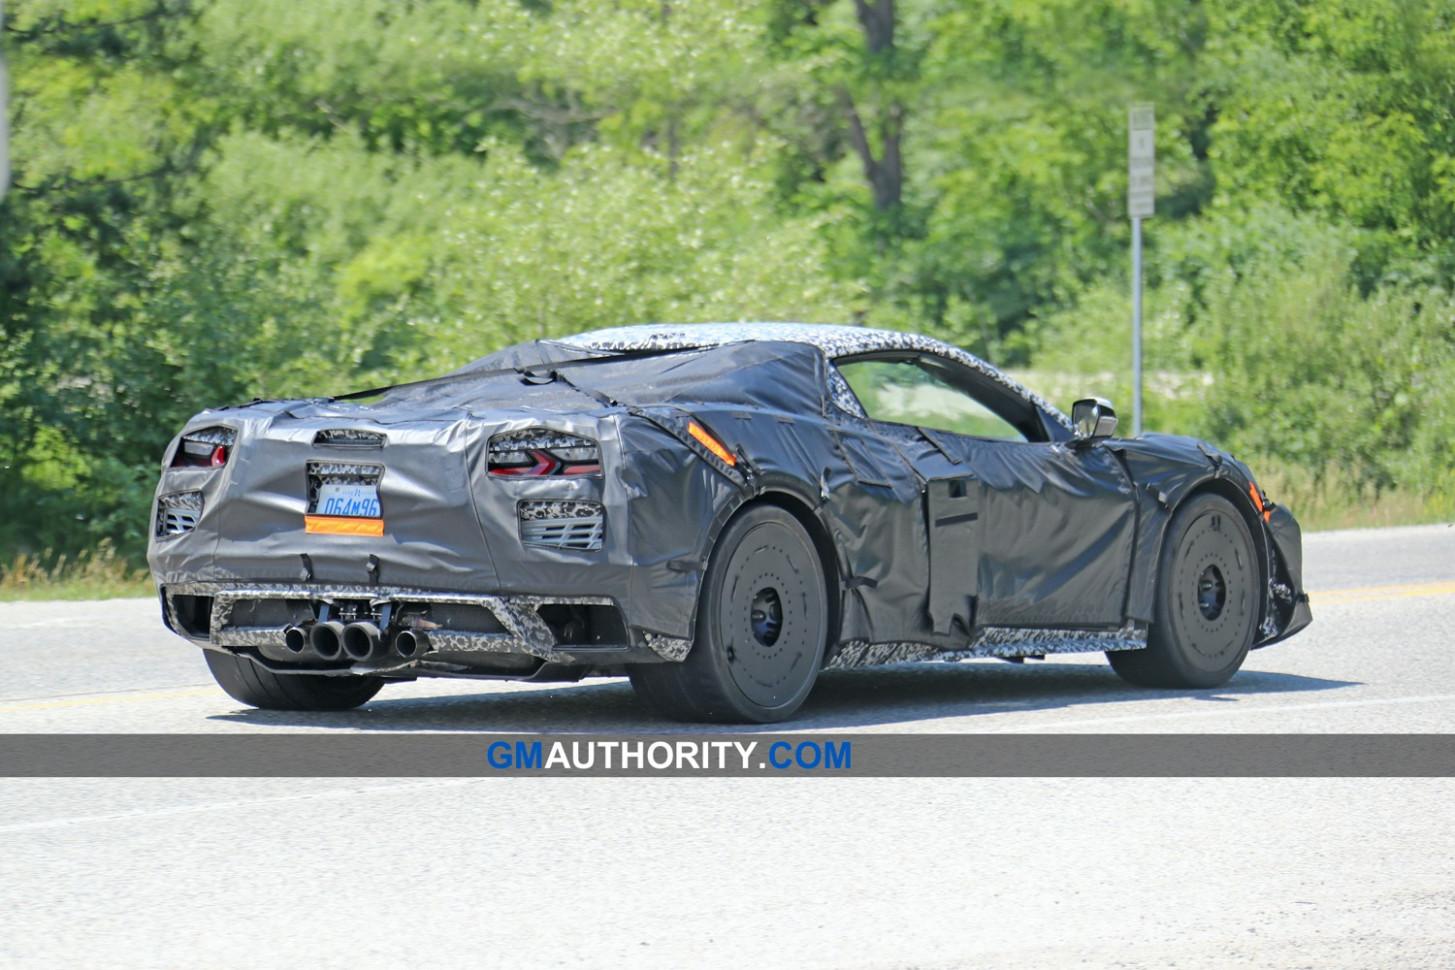 New Model and Performance 2022 Chevy Corvette Zora Zr1